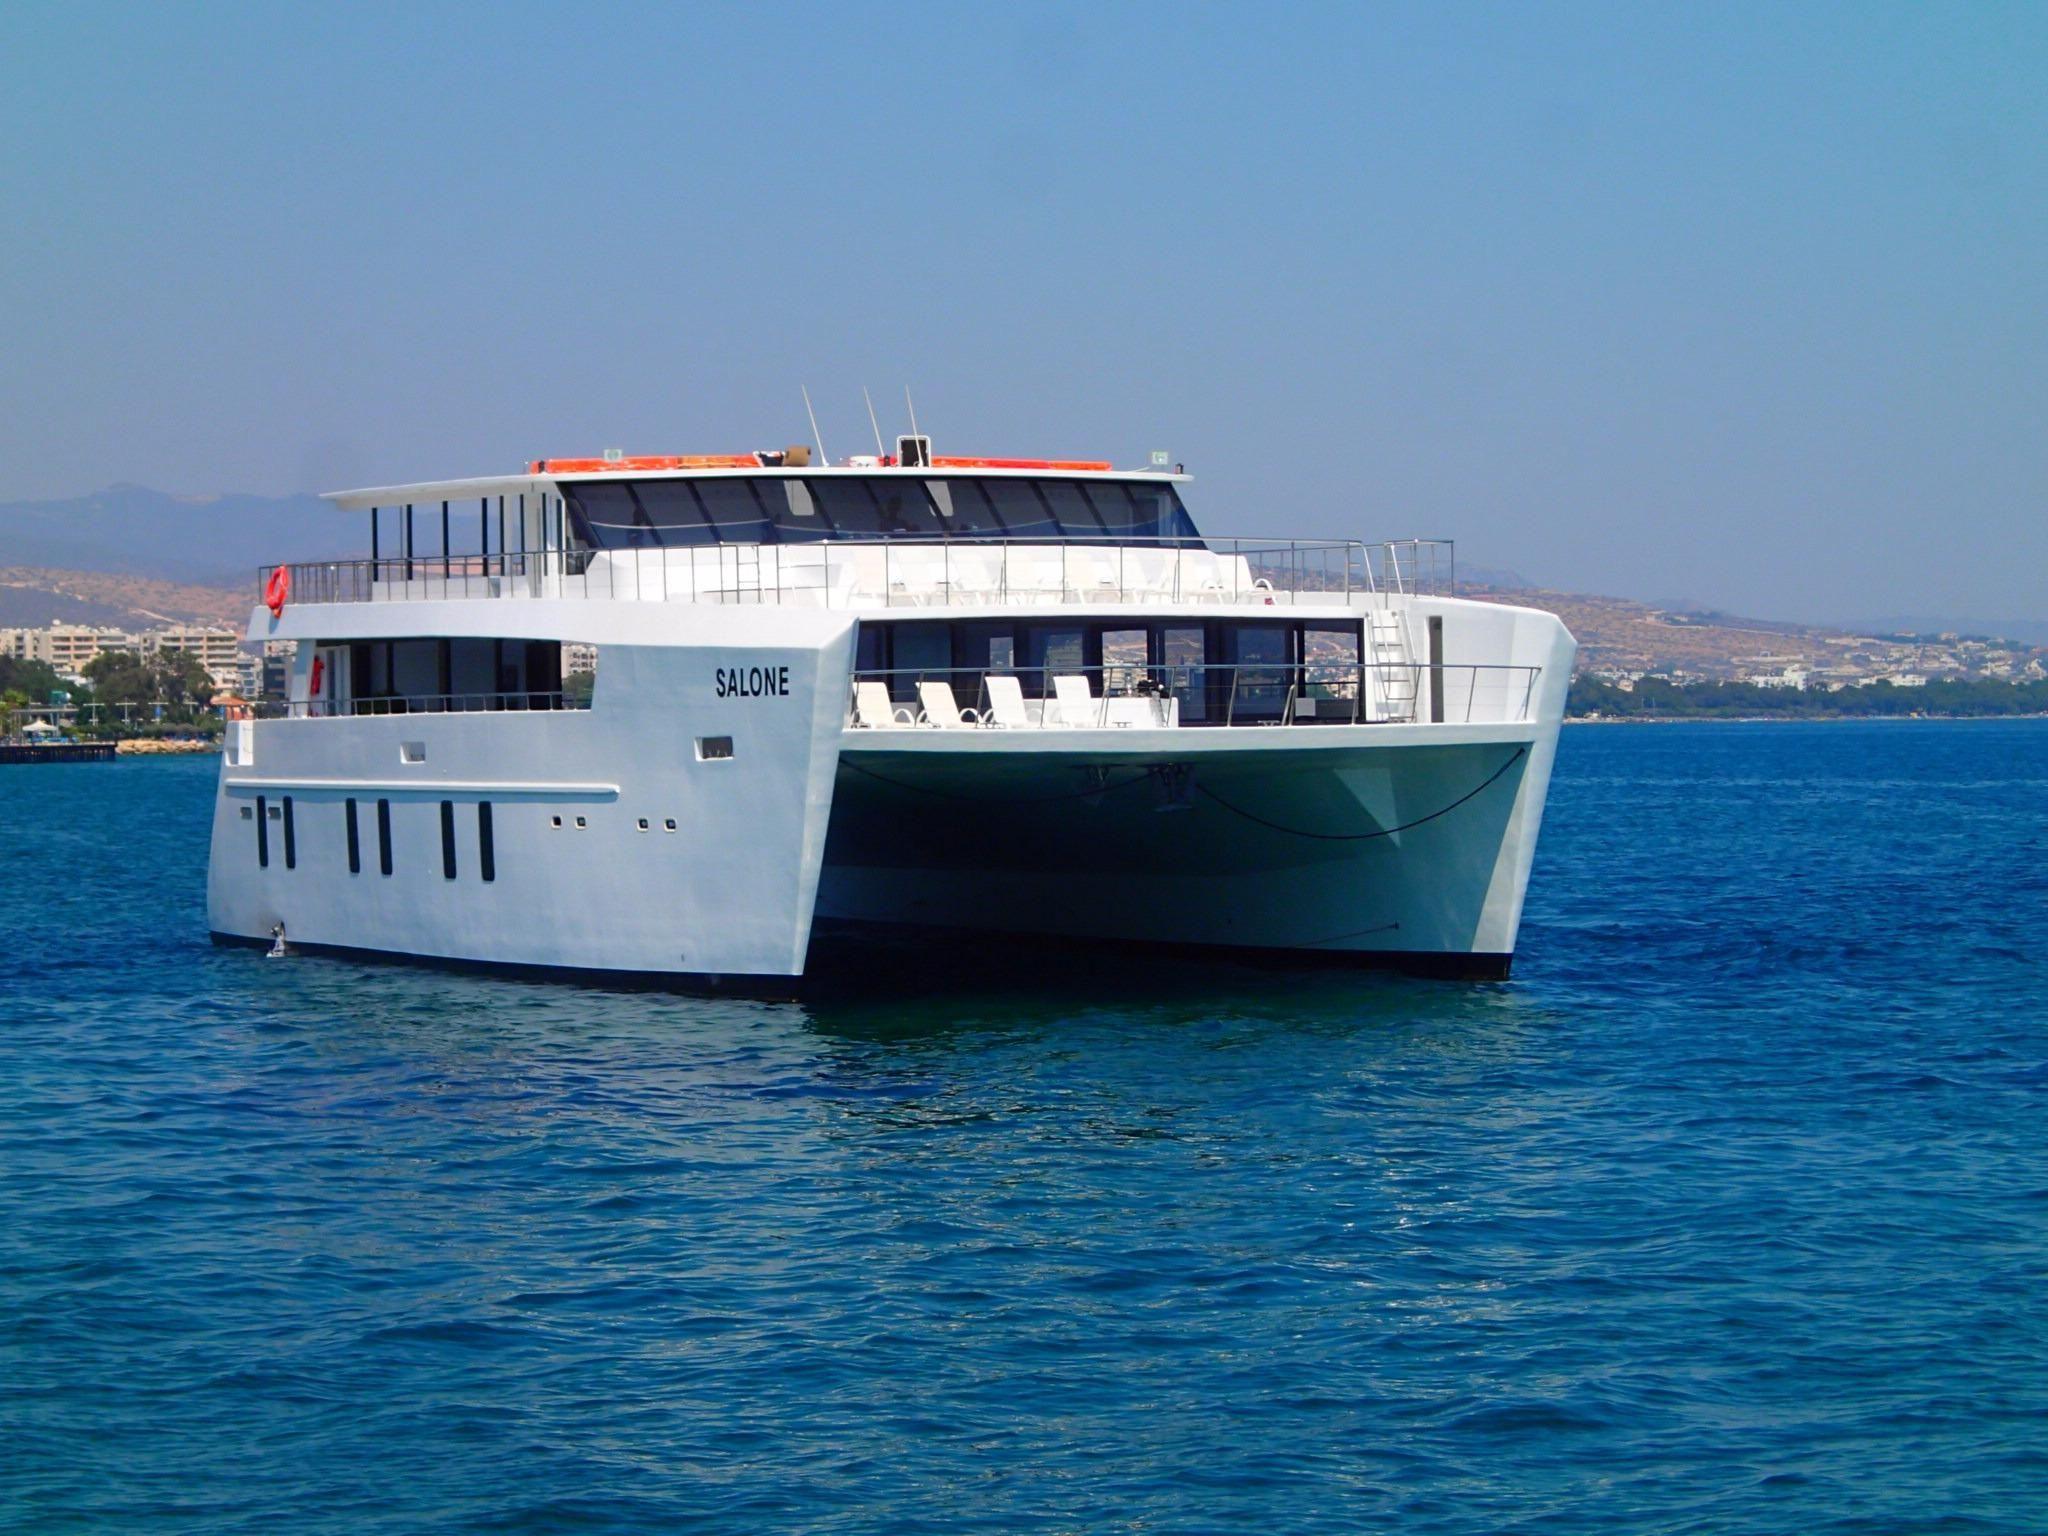 2015 Power Catamaran Power Boat For Sale - www.yachtworld.com  2015 Power Cata...